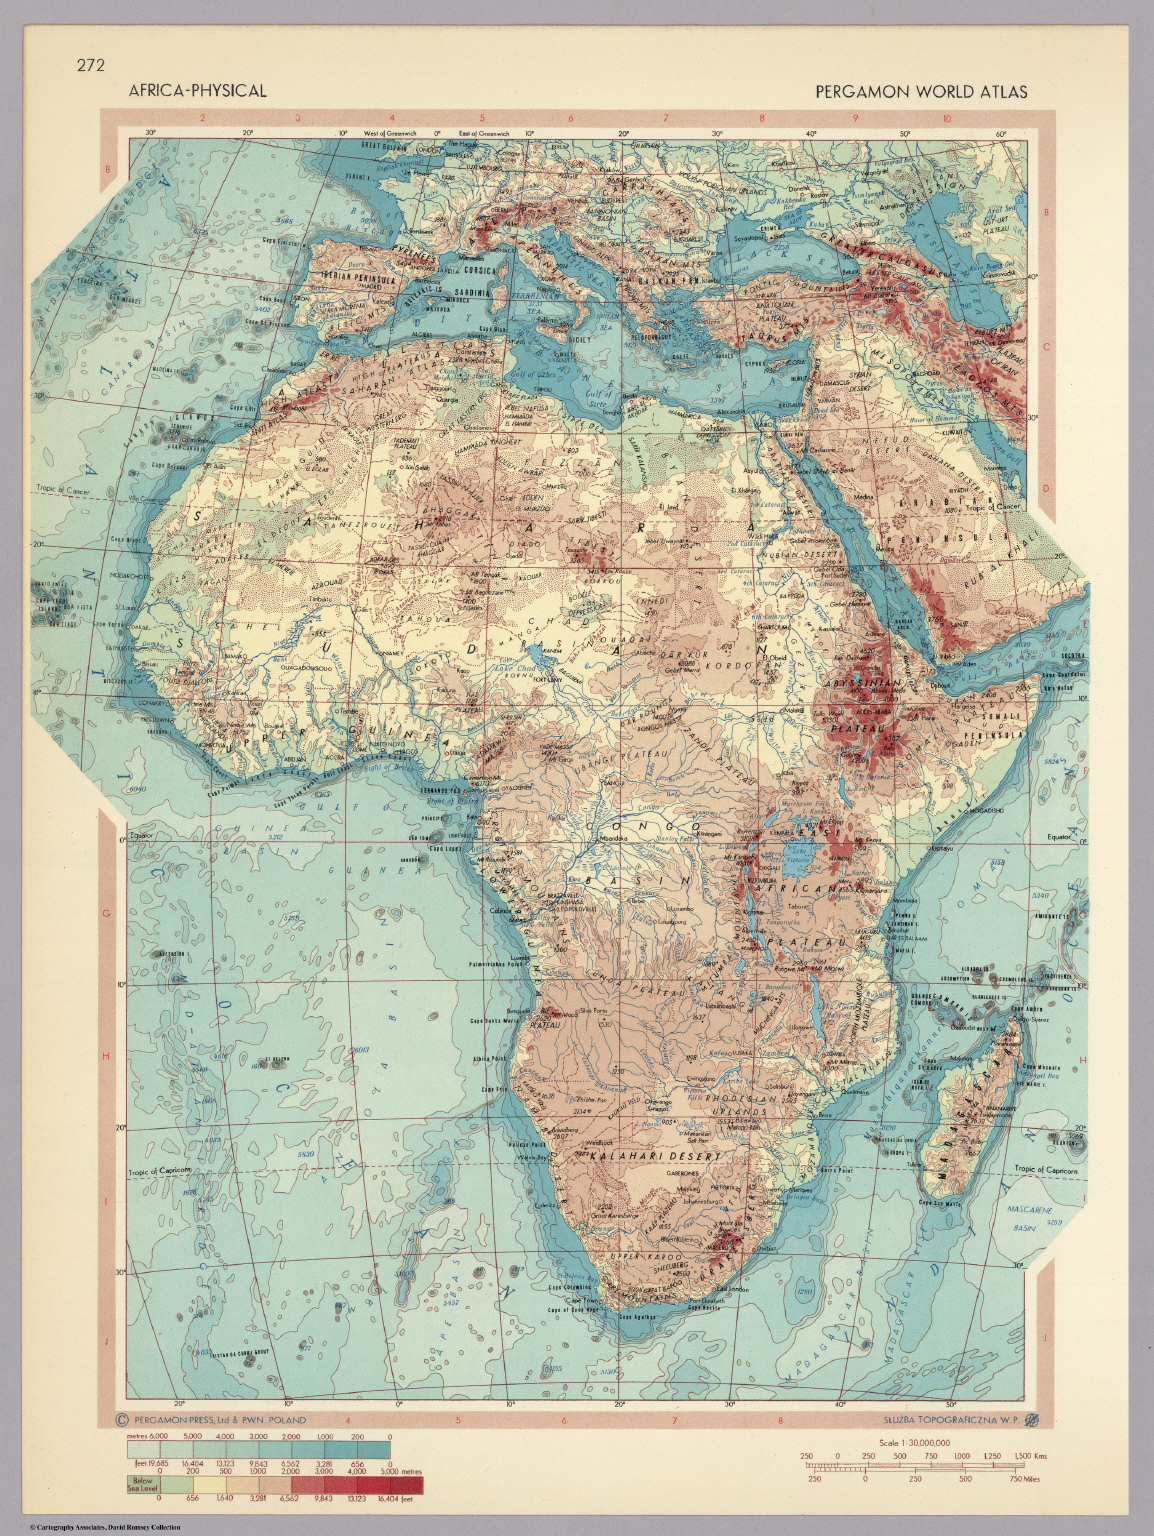 Africa physical pergamon world atlas david rumsey historical pergamon world atlas gumiabroncs Image collections